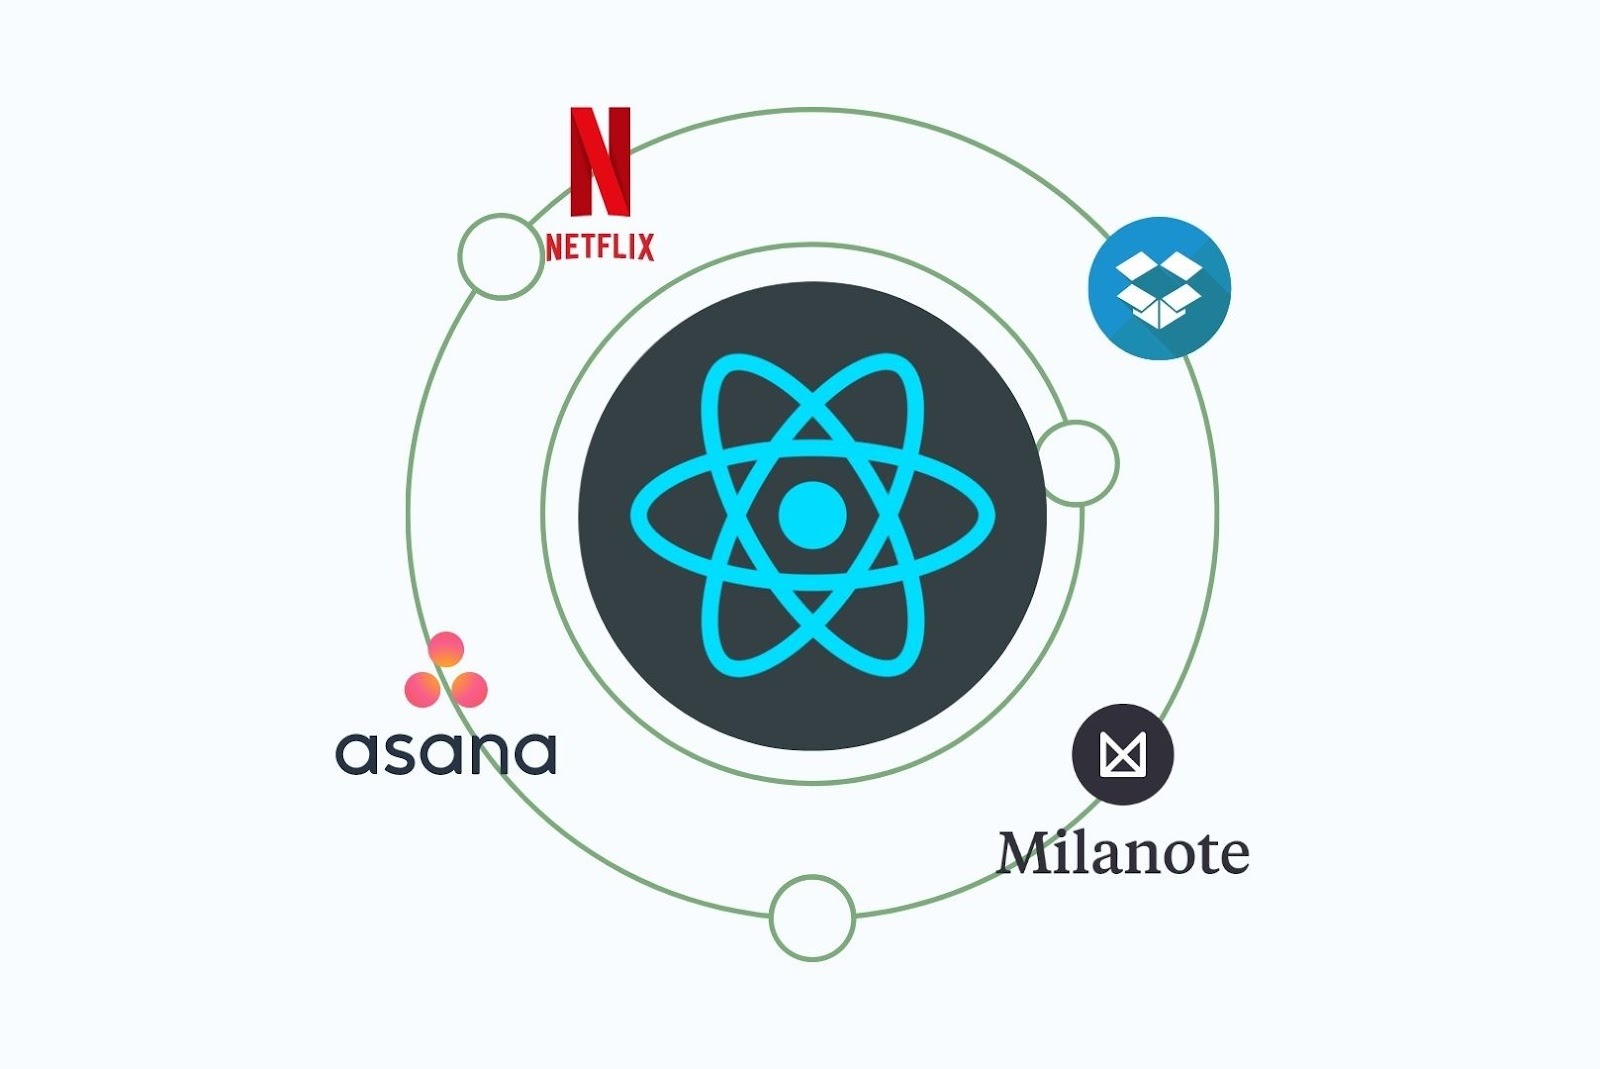 Saas Application built with reactjs